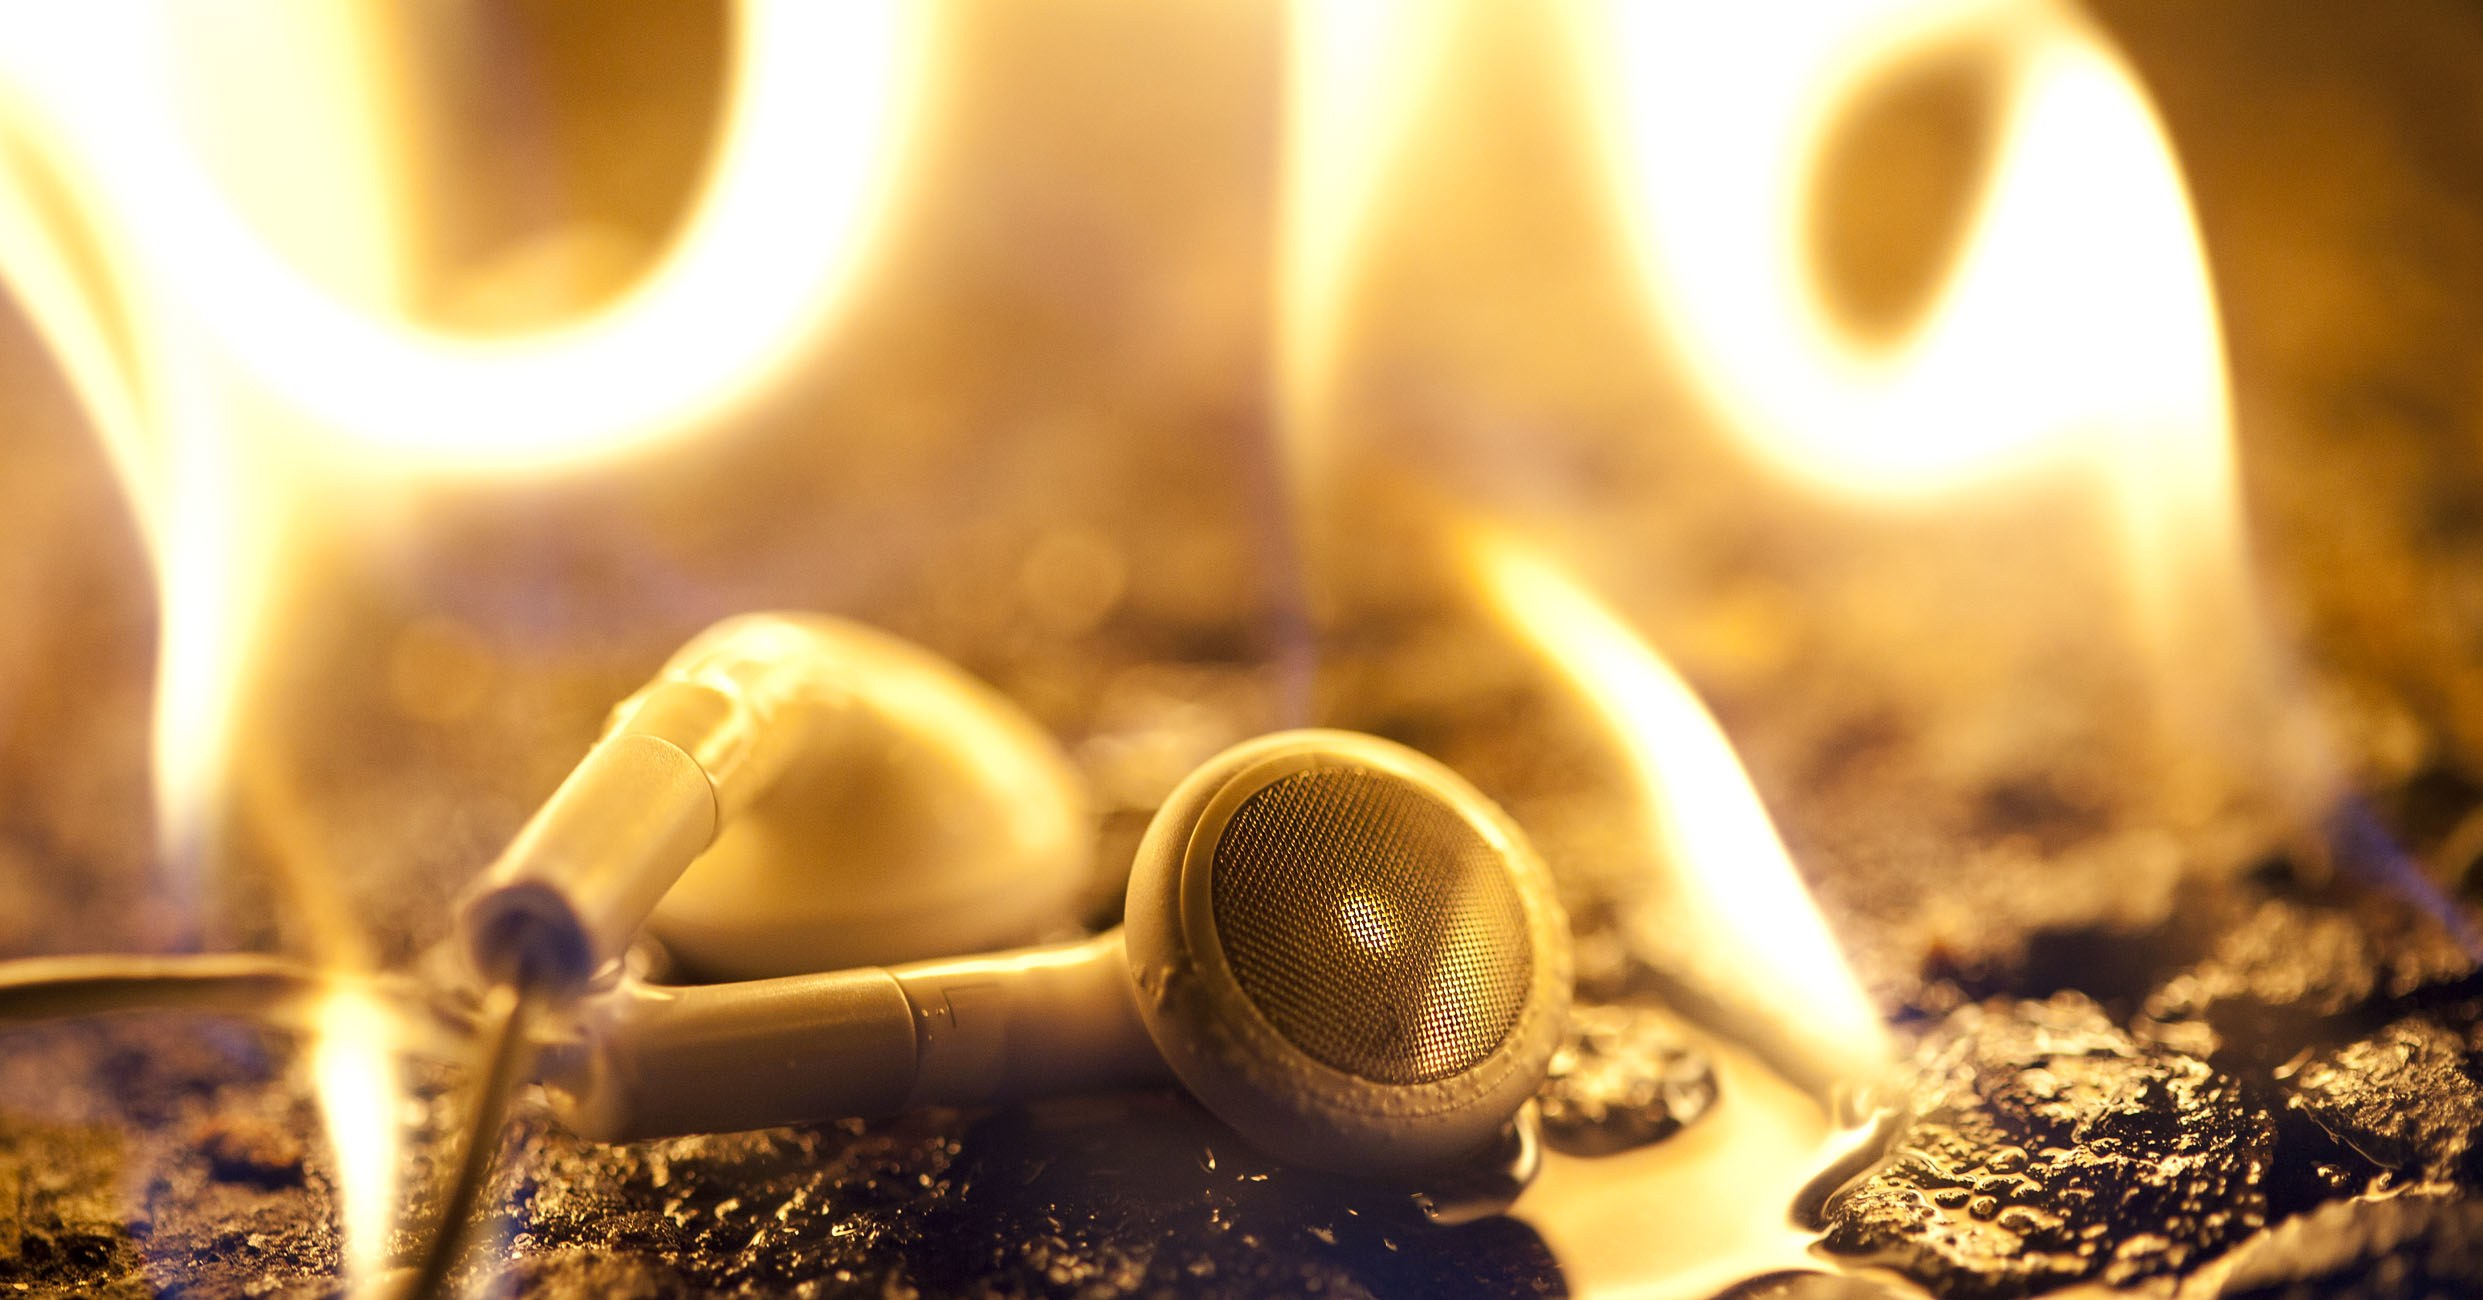 131115_burning_headphones_01.jpg